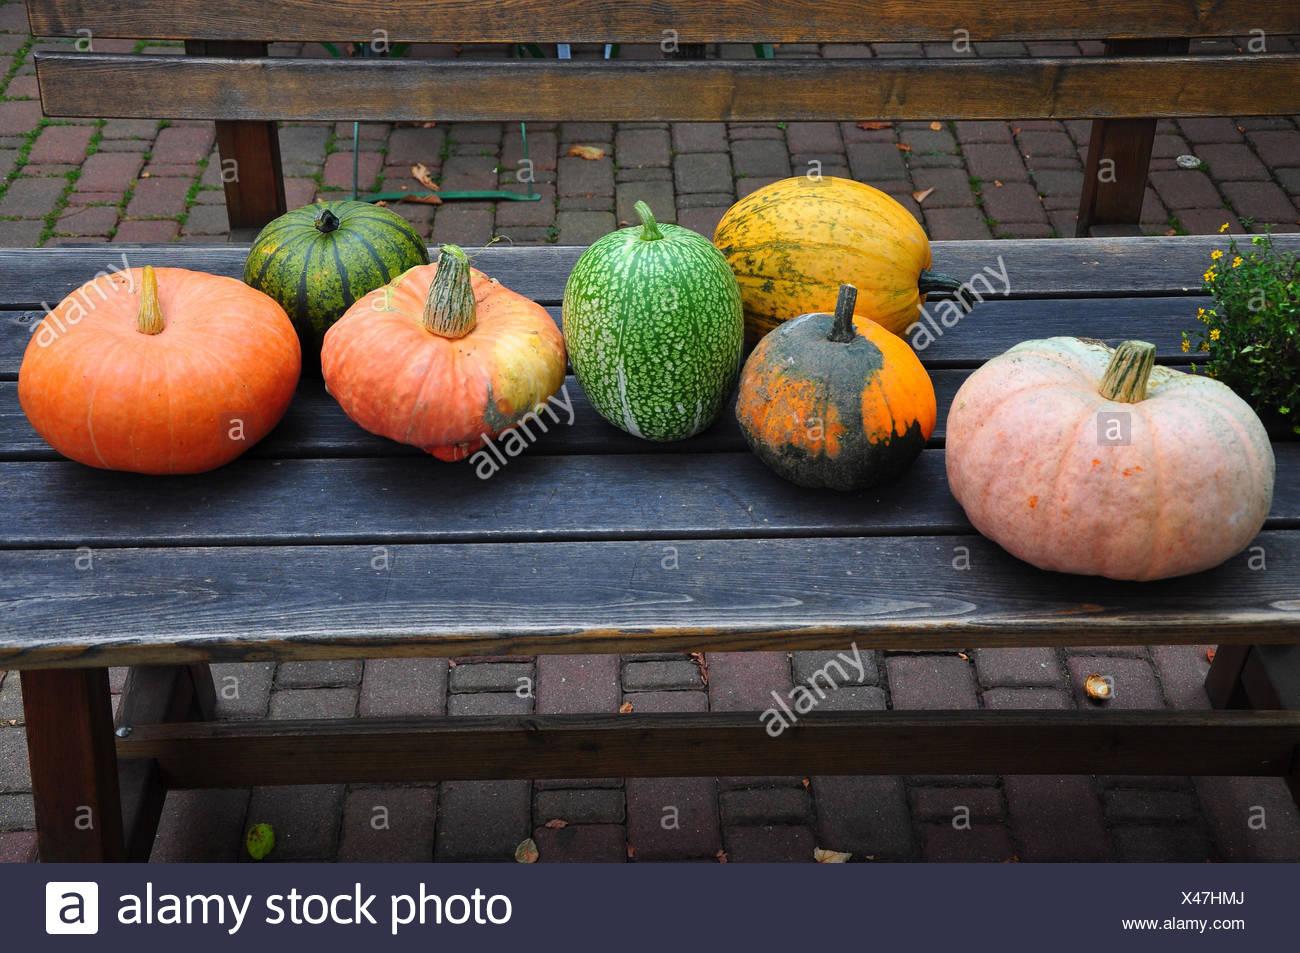 Ornamental pumpkins, wooden table, - Stock Image